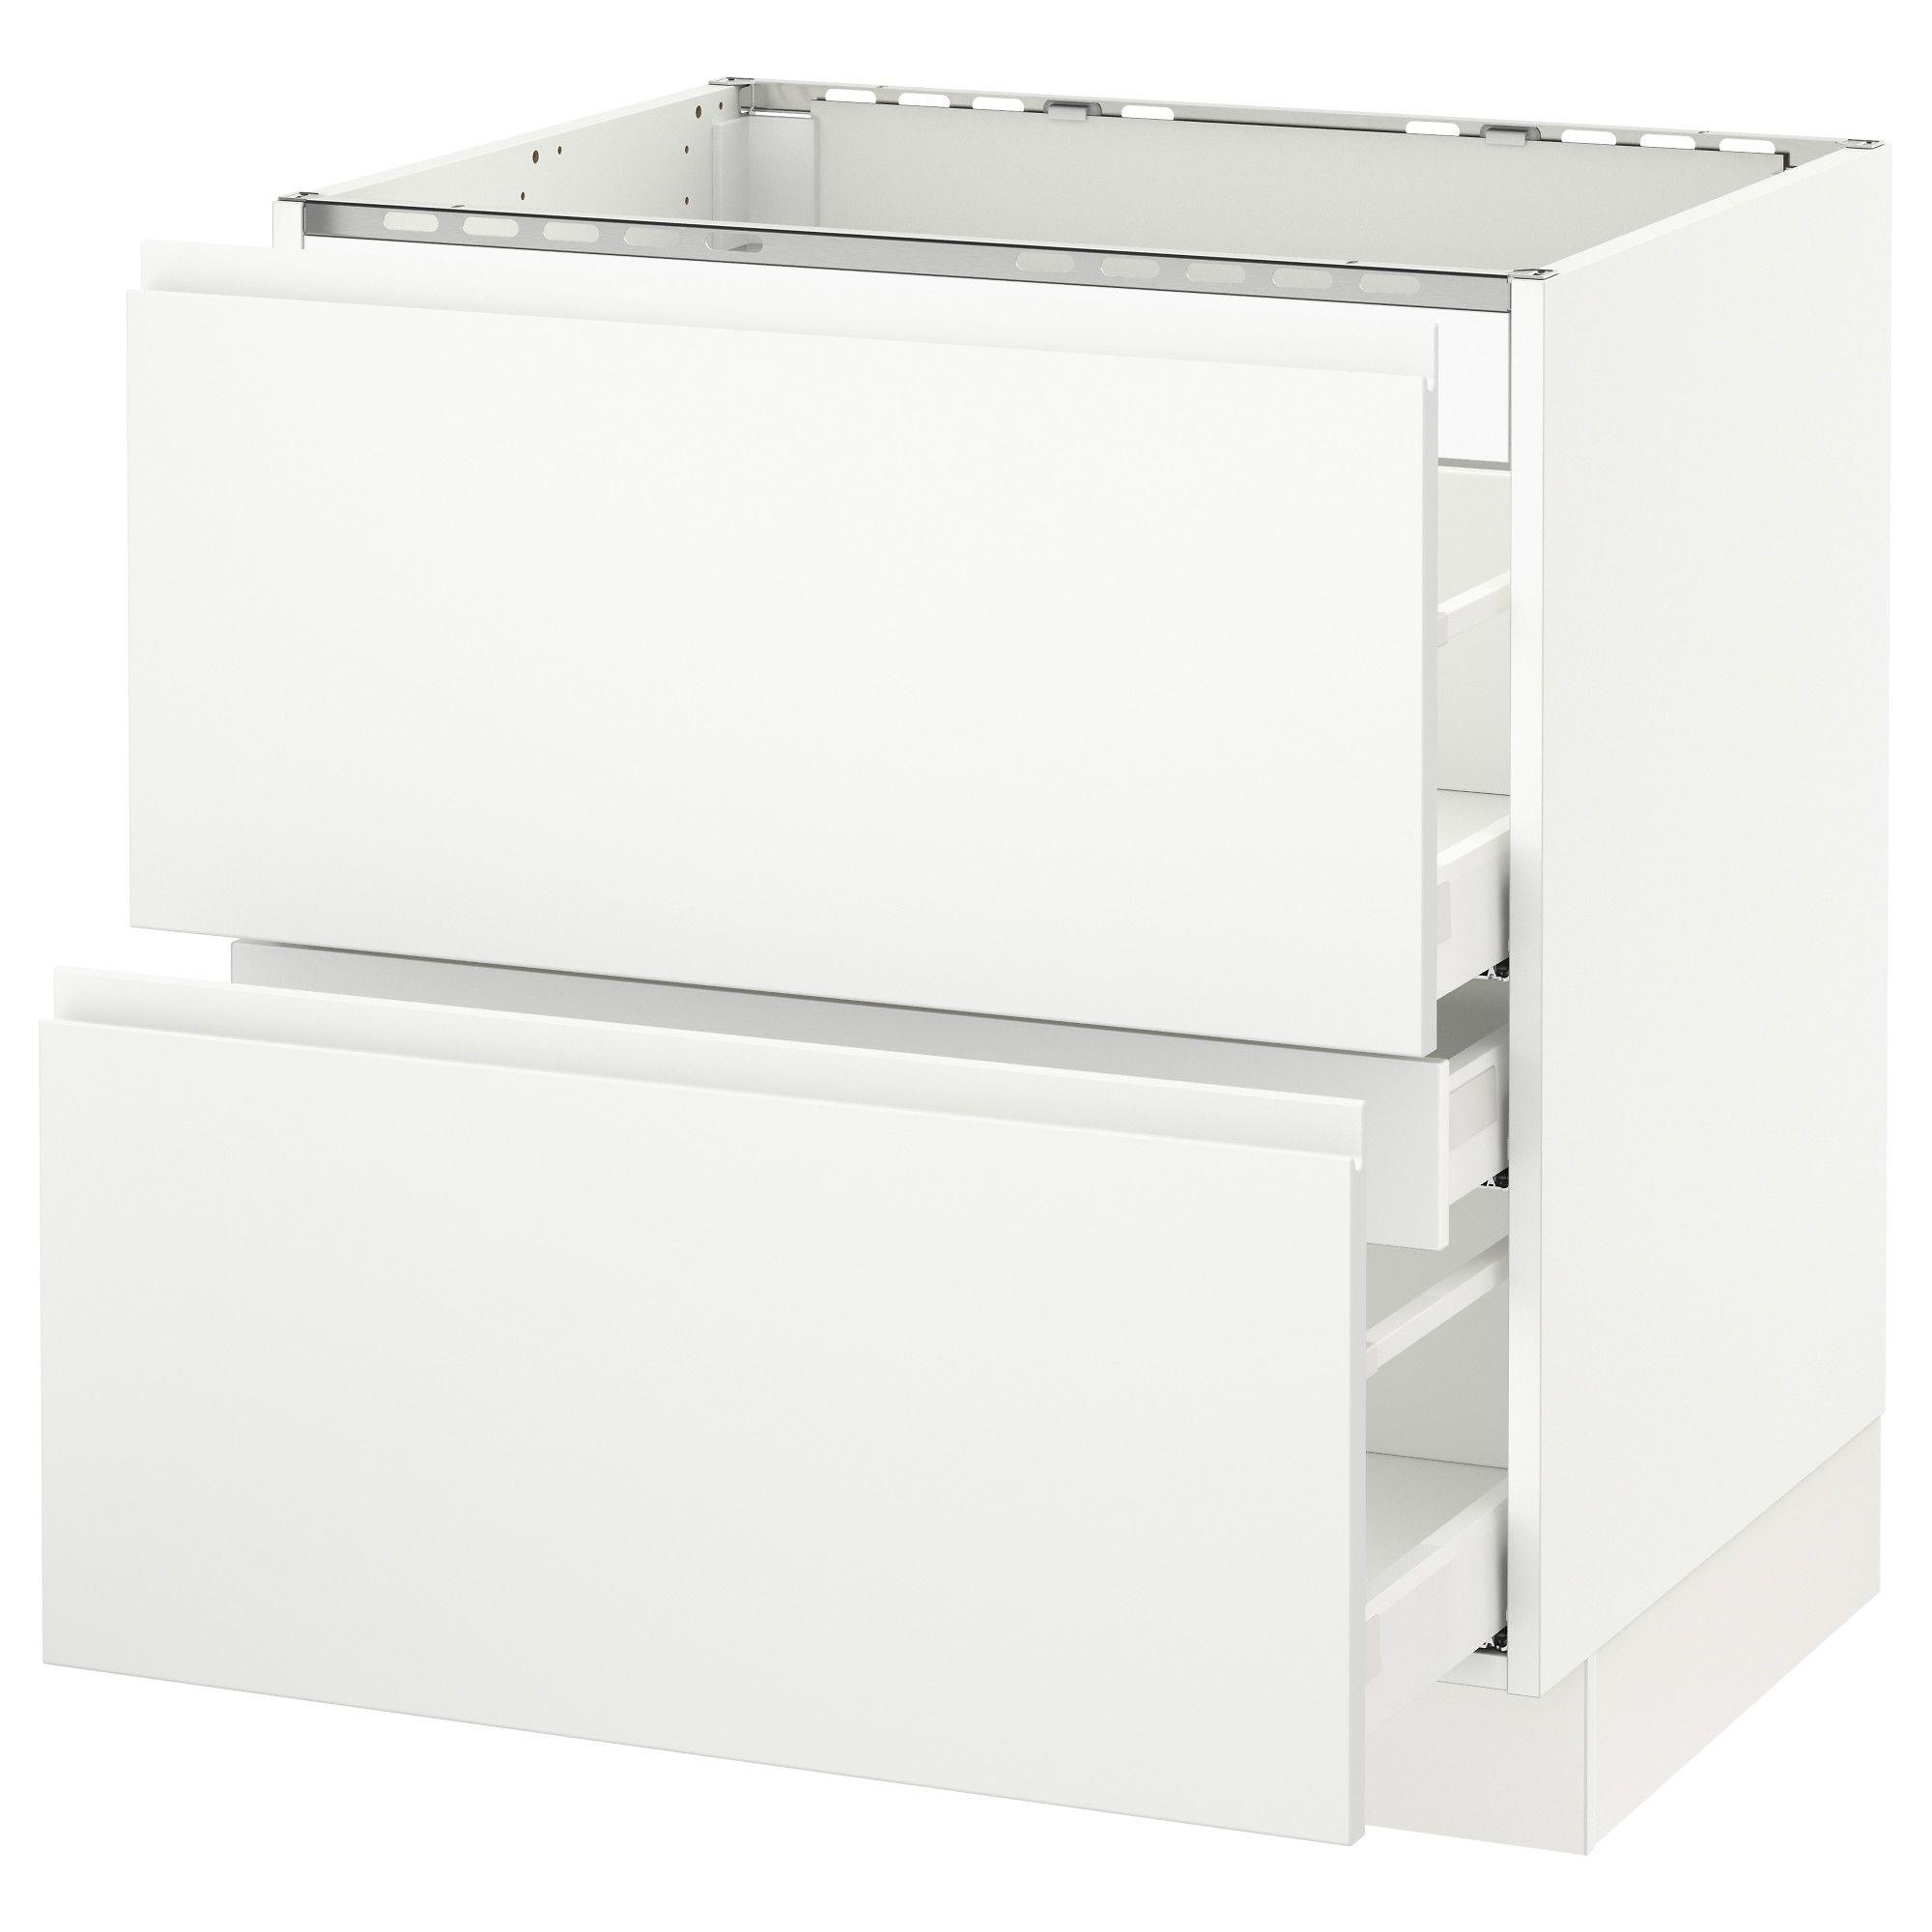 IKEA SEKTION white Base f/cooktop w/3 drawers